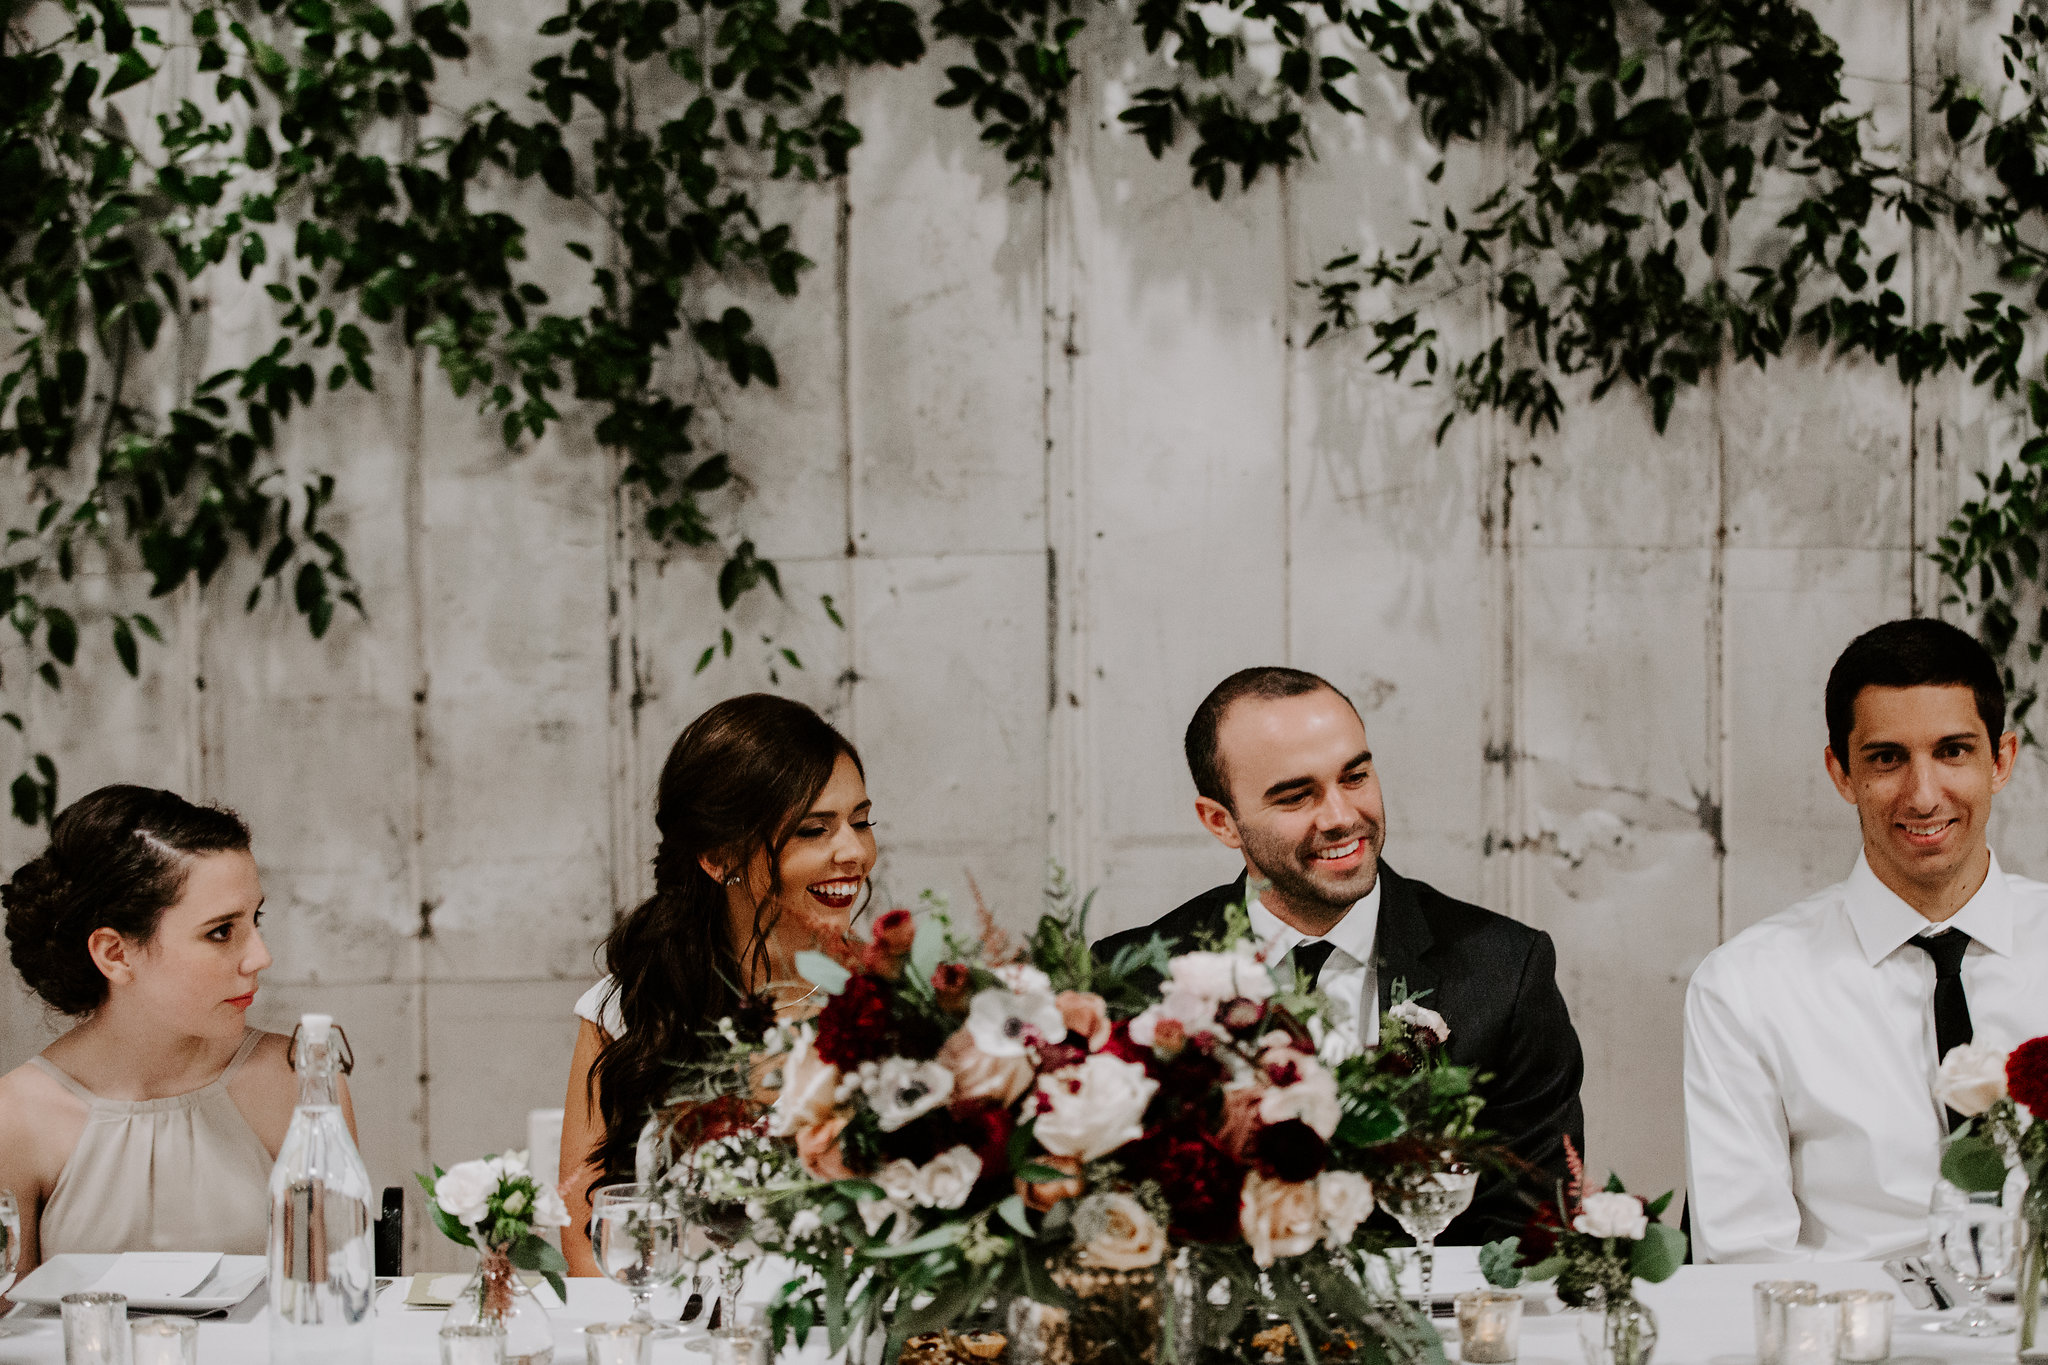 Minimalist Industrial Wedding A Griffin Events Mikayla Herrick DC597.jpg